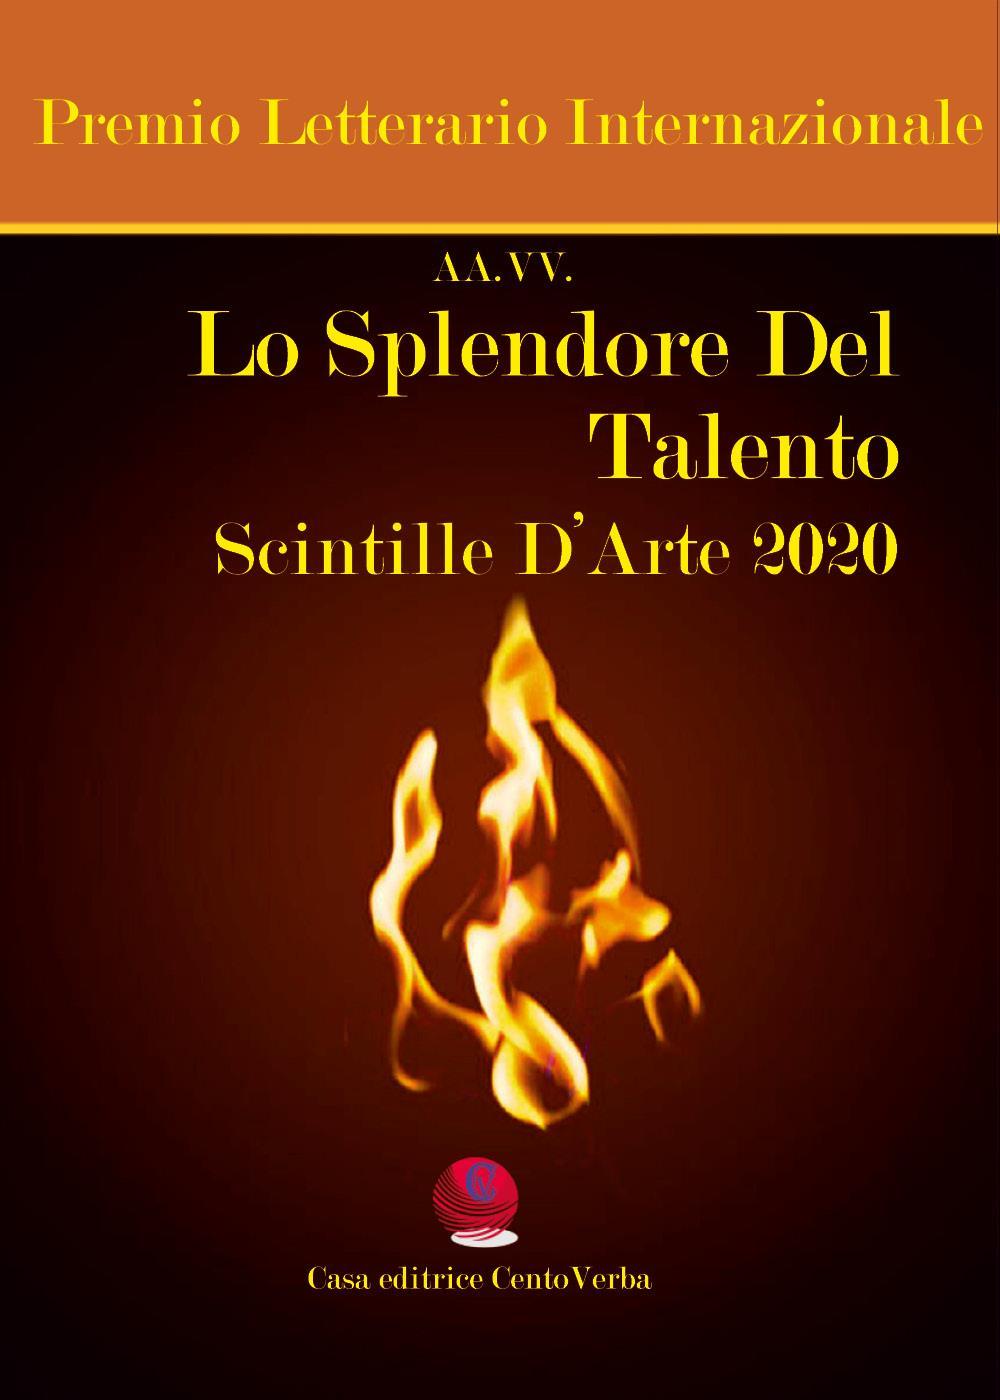 Lo Splendore Del Talento - Scintille D'Arte 2020